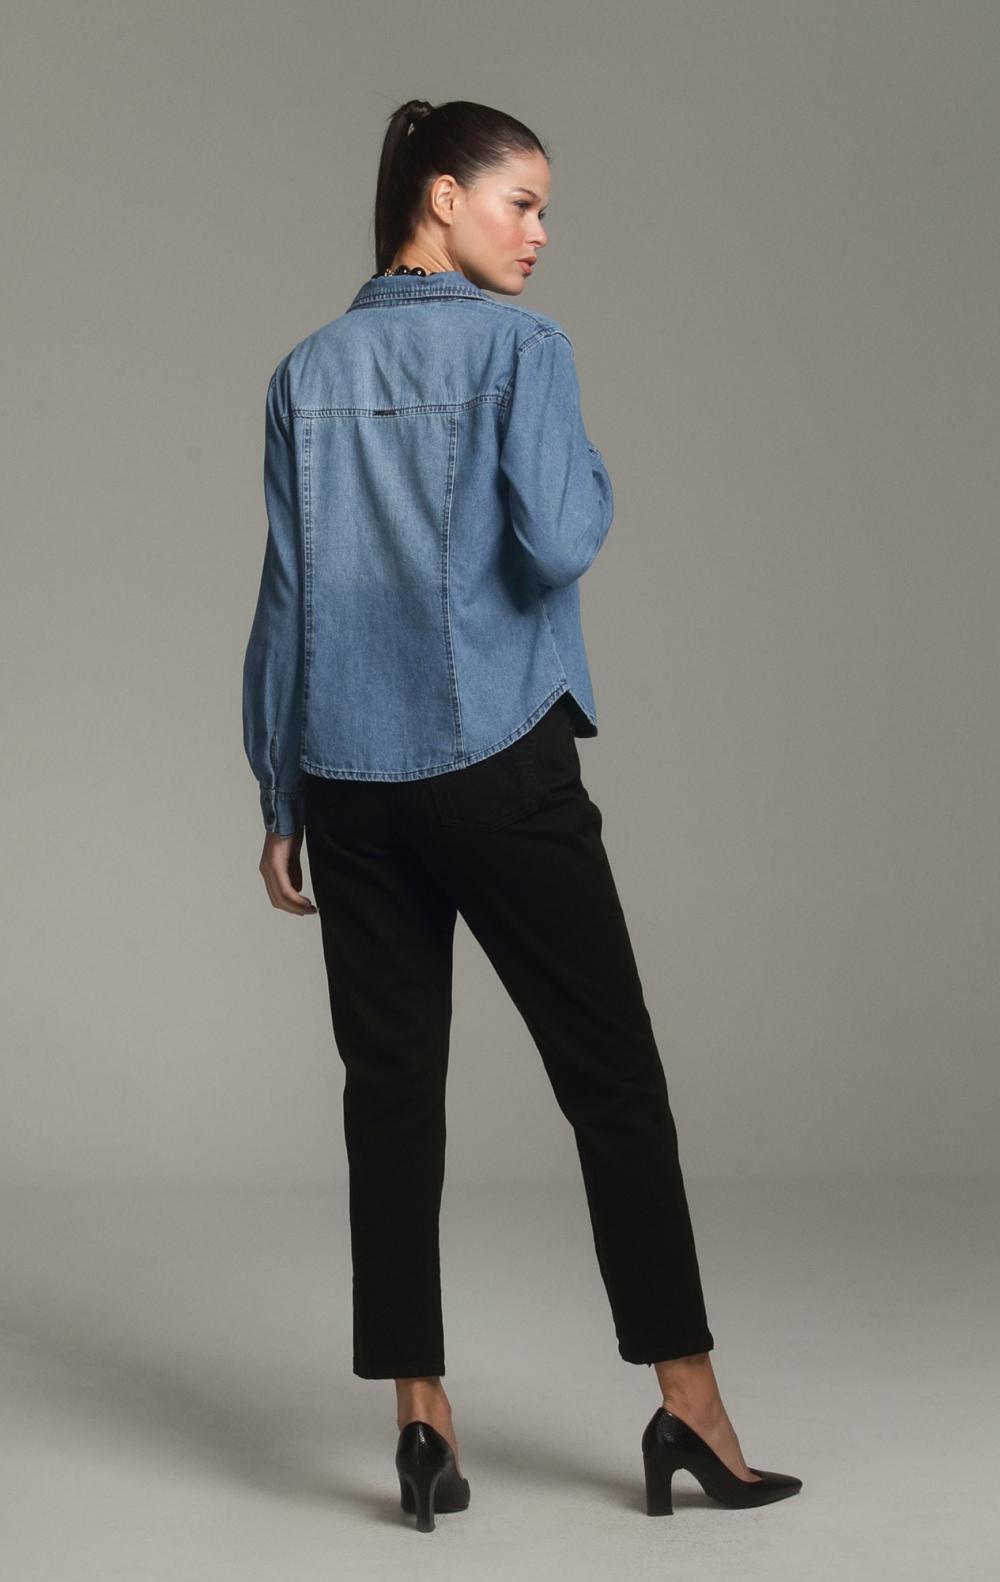 Camisa Jeans - Foto 2